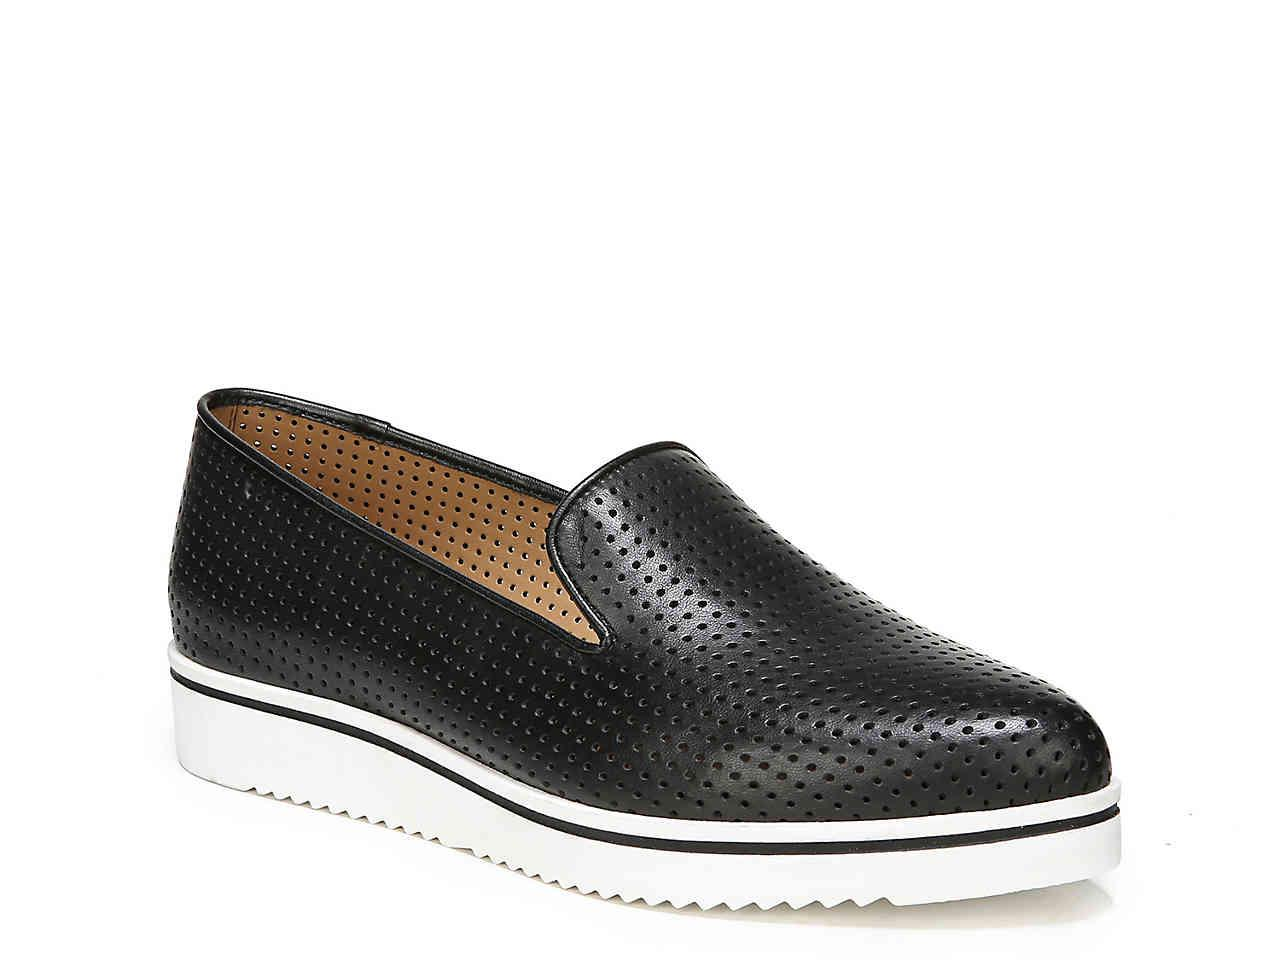 8ea90592044e Lyst - Franco Sarto Fabrina Wedge Loafer in Black